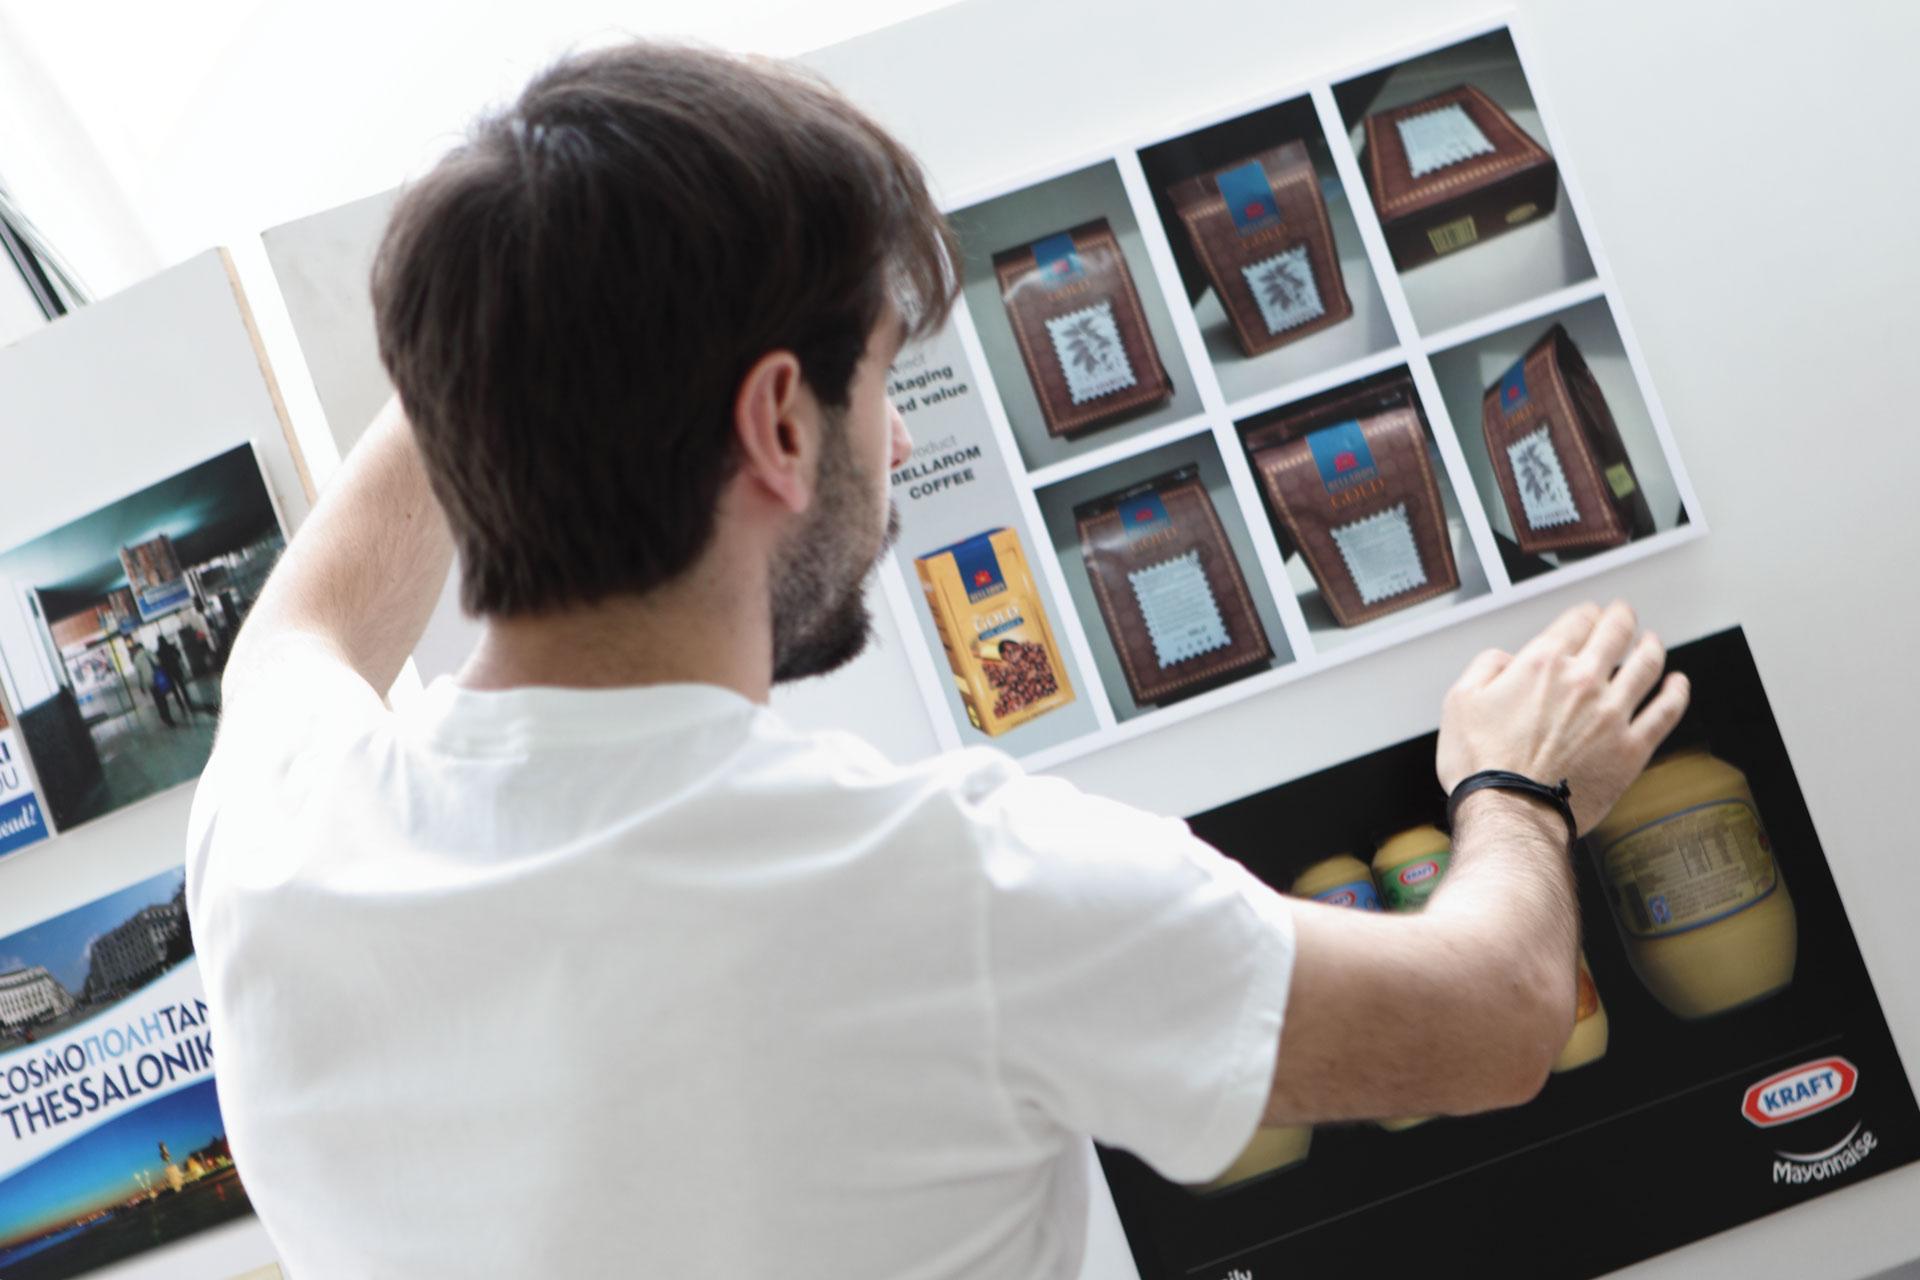 Graduate with a portfolio of design work to impress prospective employers